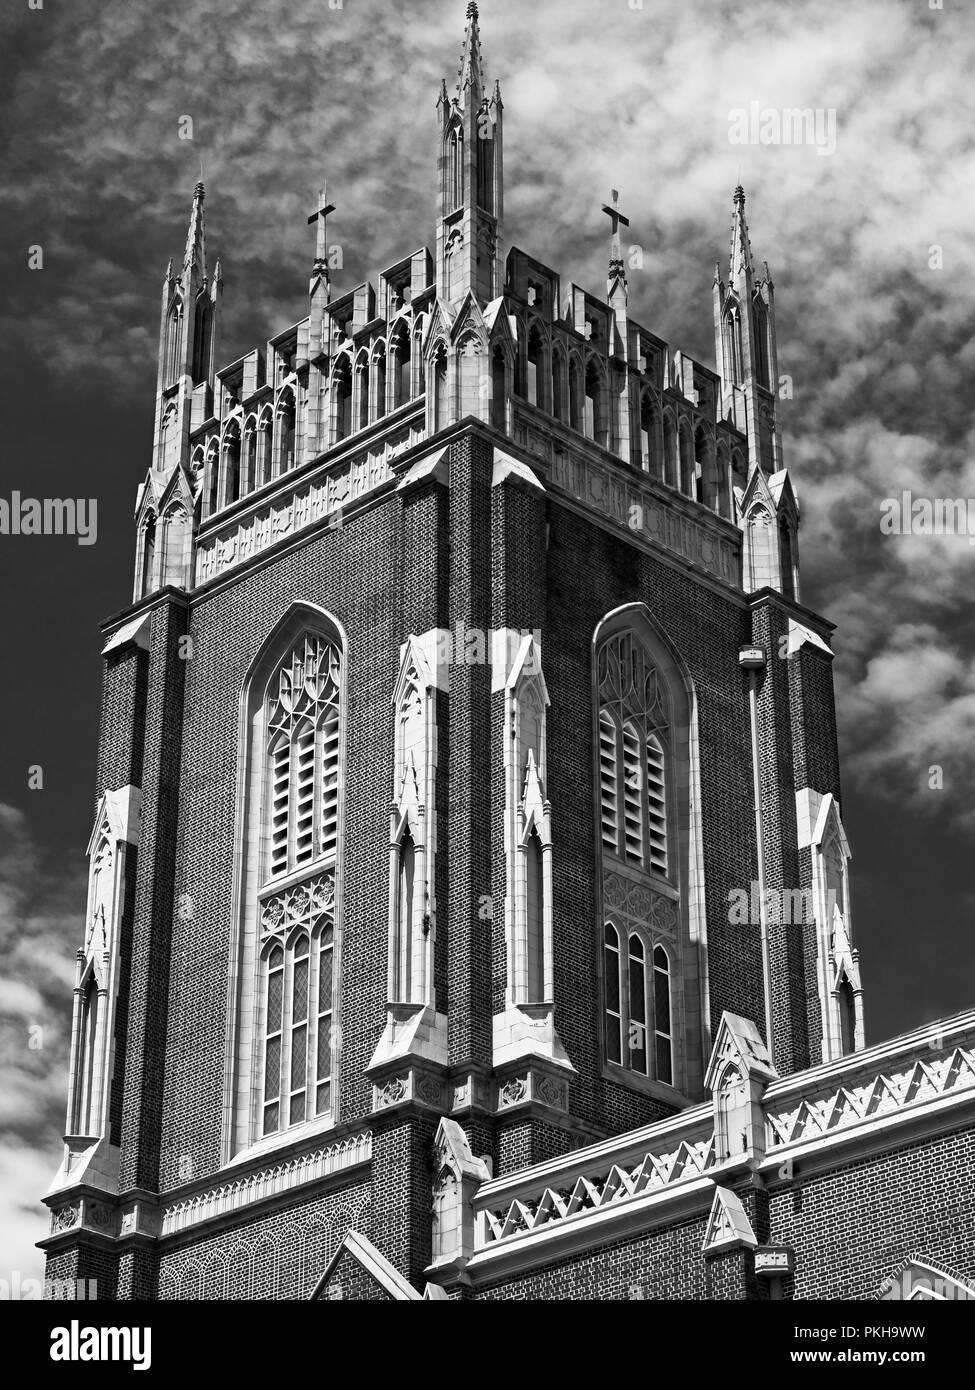 New Orleans, LA USA - May 9, 2018  -  Holy Name Of Jesus Catholic Church Loyola Campus off of St. Charles Ave 2 /v&W - Stock Image